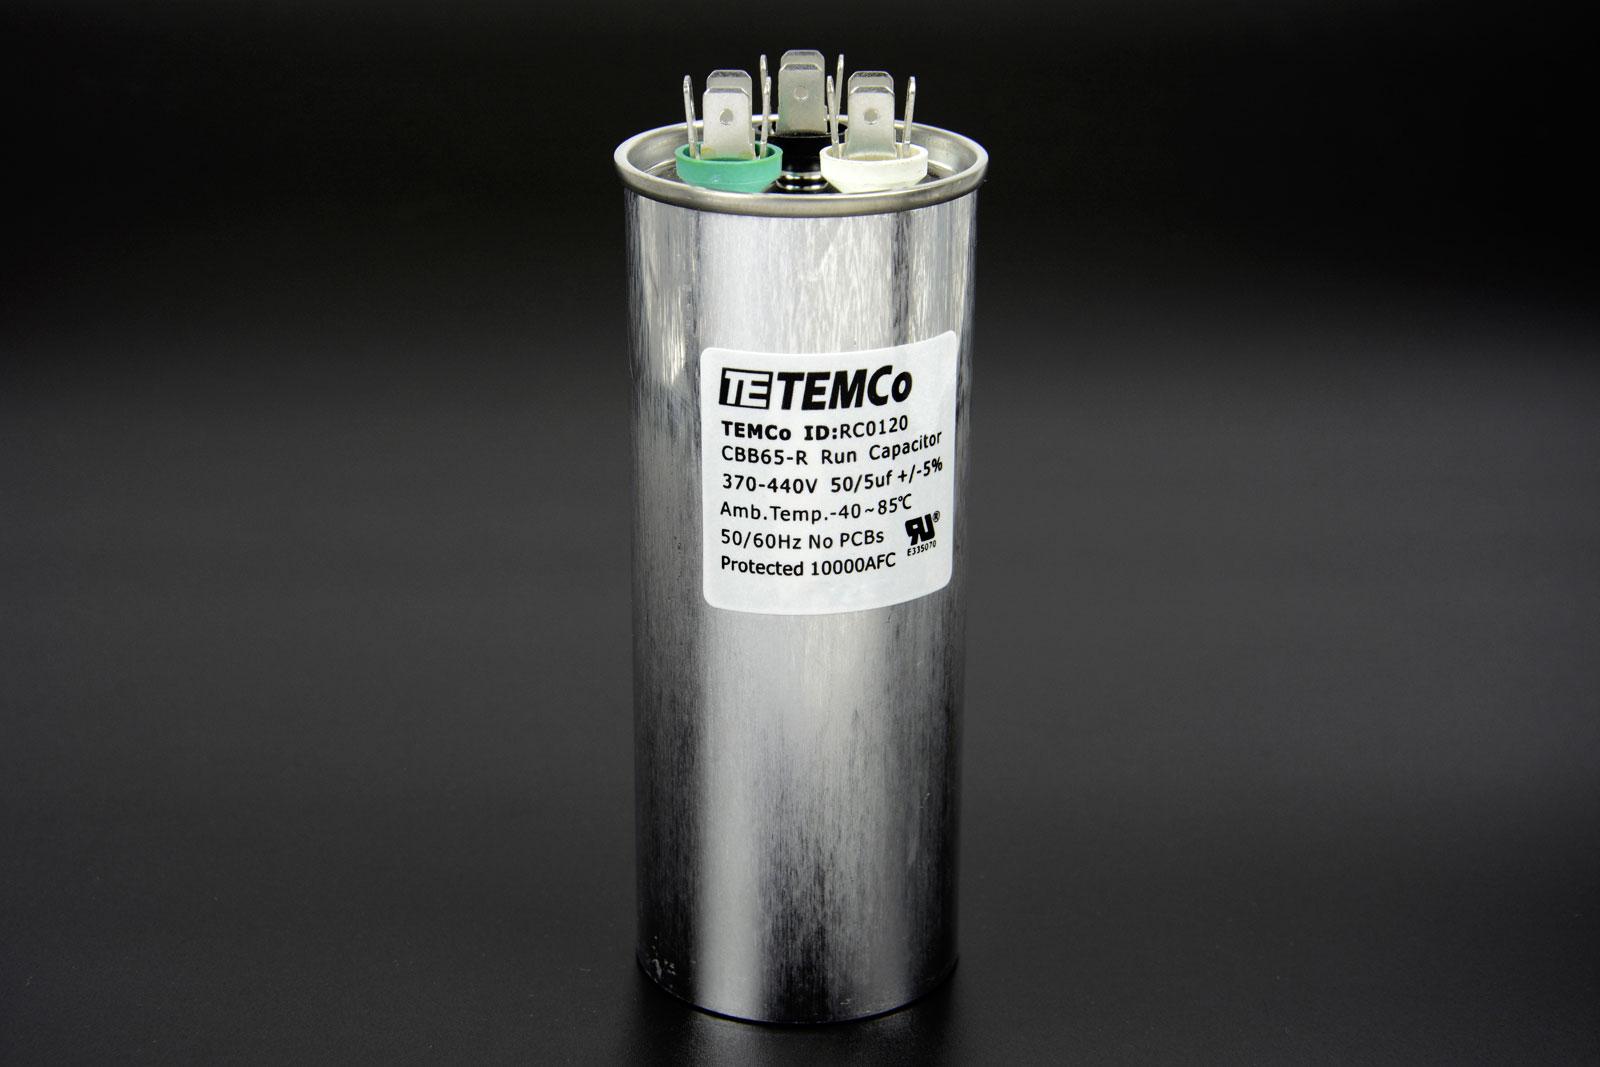 440 vac 3 phase motor wiring 460 volt 3 phase wiring